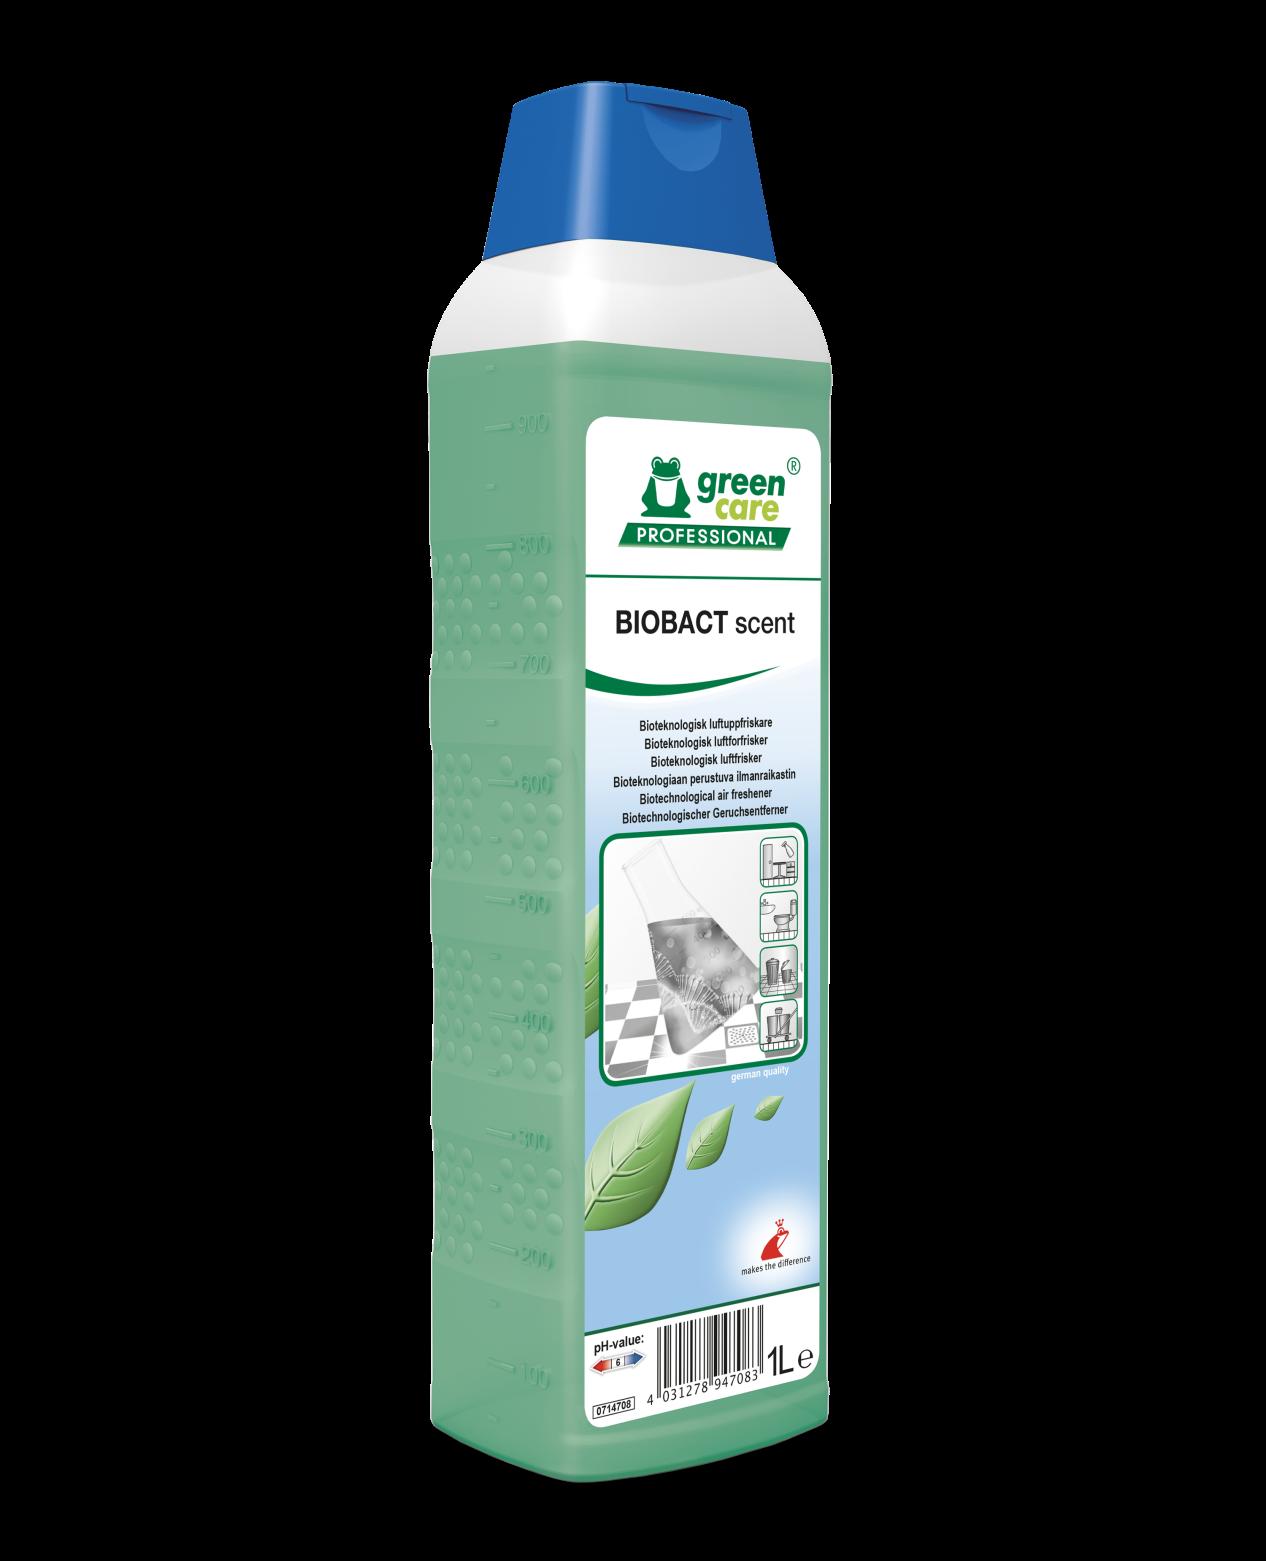 Detergent Ecologic Pentru Curatare Si Eliminarea Mirosurilor Neplacute Biobact Scent 1l sanito.ro